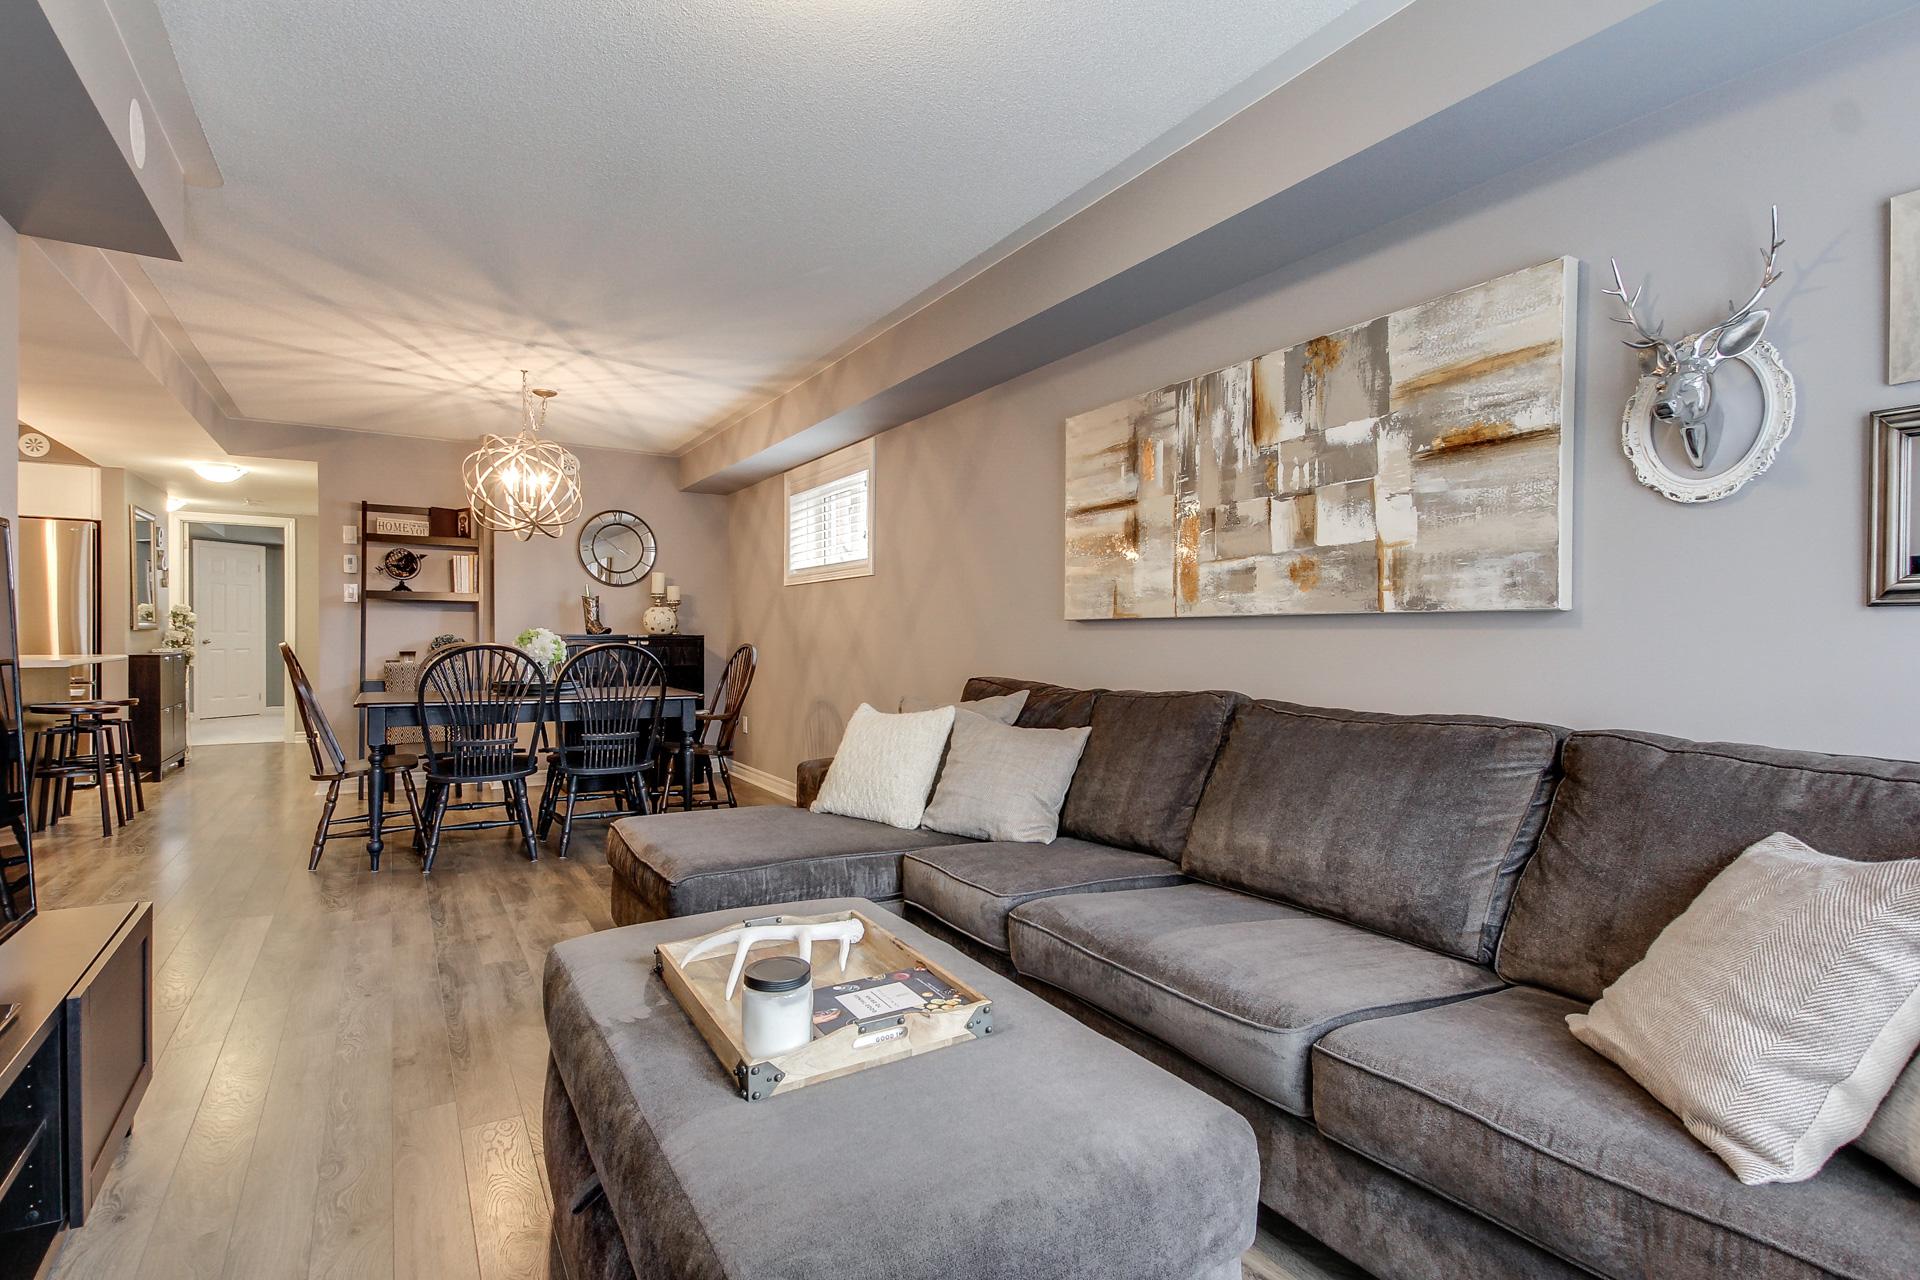 2420-Baronwood-Drive-2201-Oakville-For-Sale-Karly-Moore (8).jpg